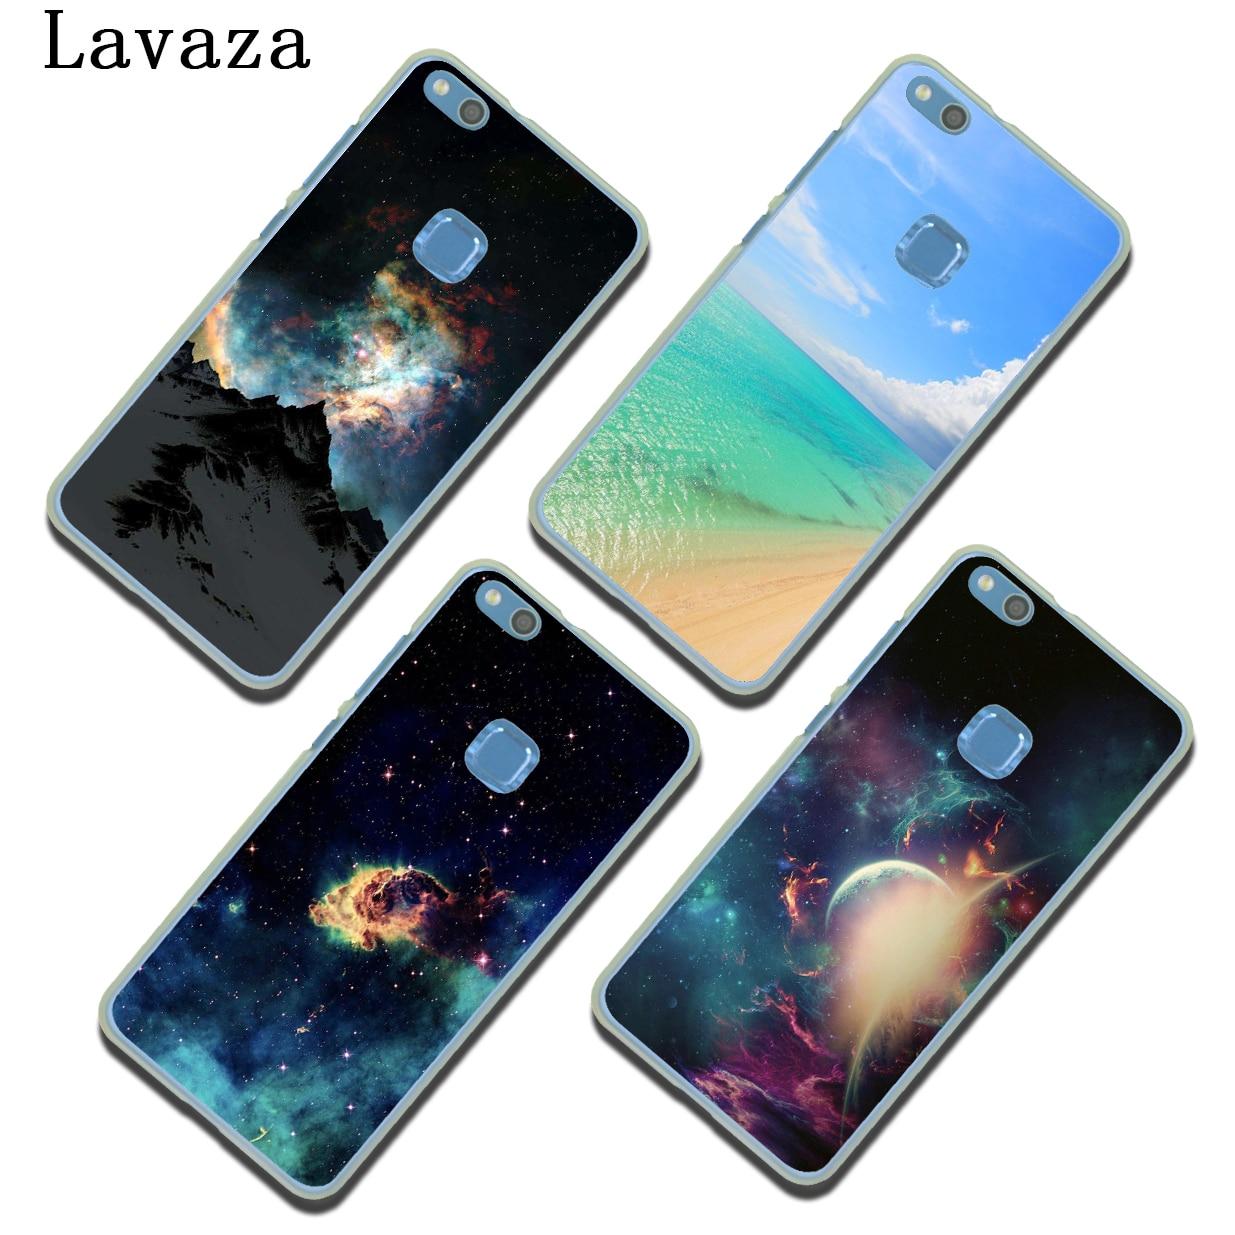 Lavaza Ocean Water Sky Universe Planet Street Case for Huawei Y6 Y3 Y5 II Y7 2017 Nova 2 Plus 2S 2i Honor 9 8 Lite 7 6 6A 7X 6X